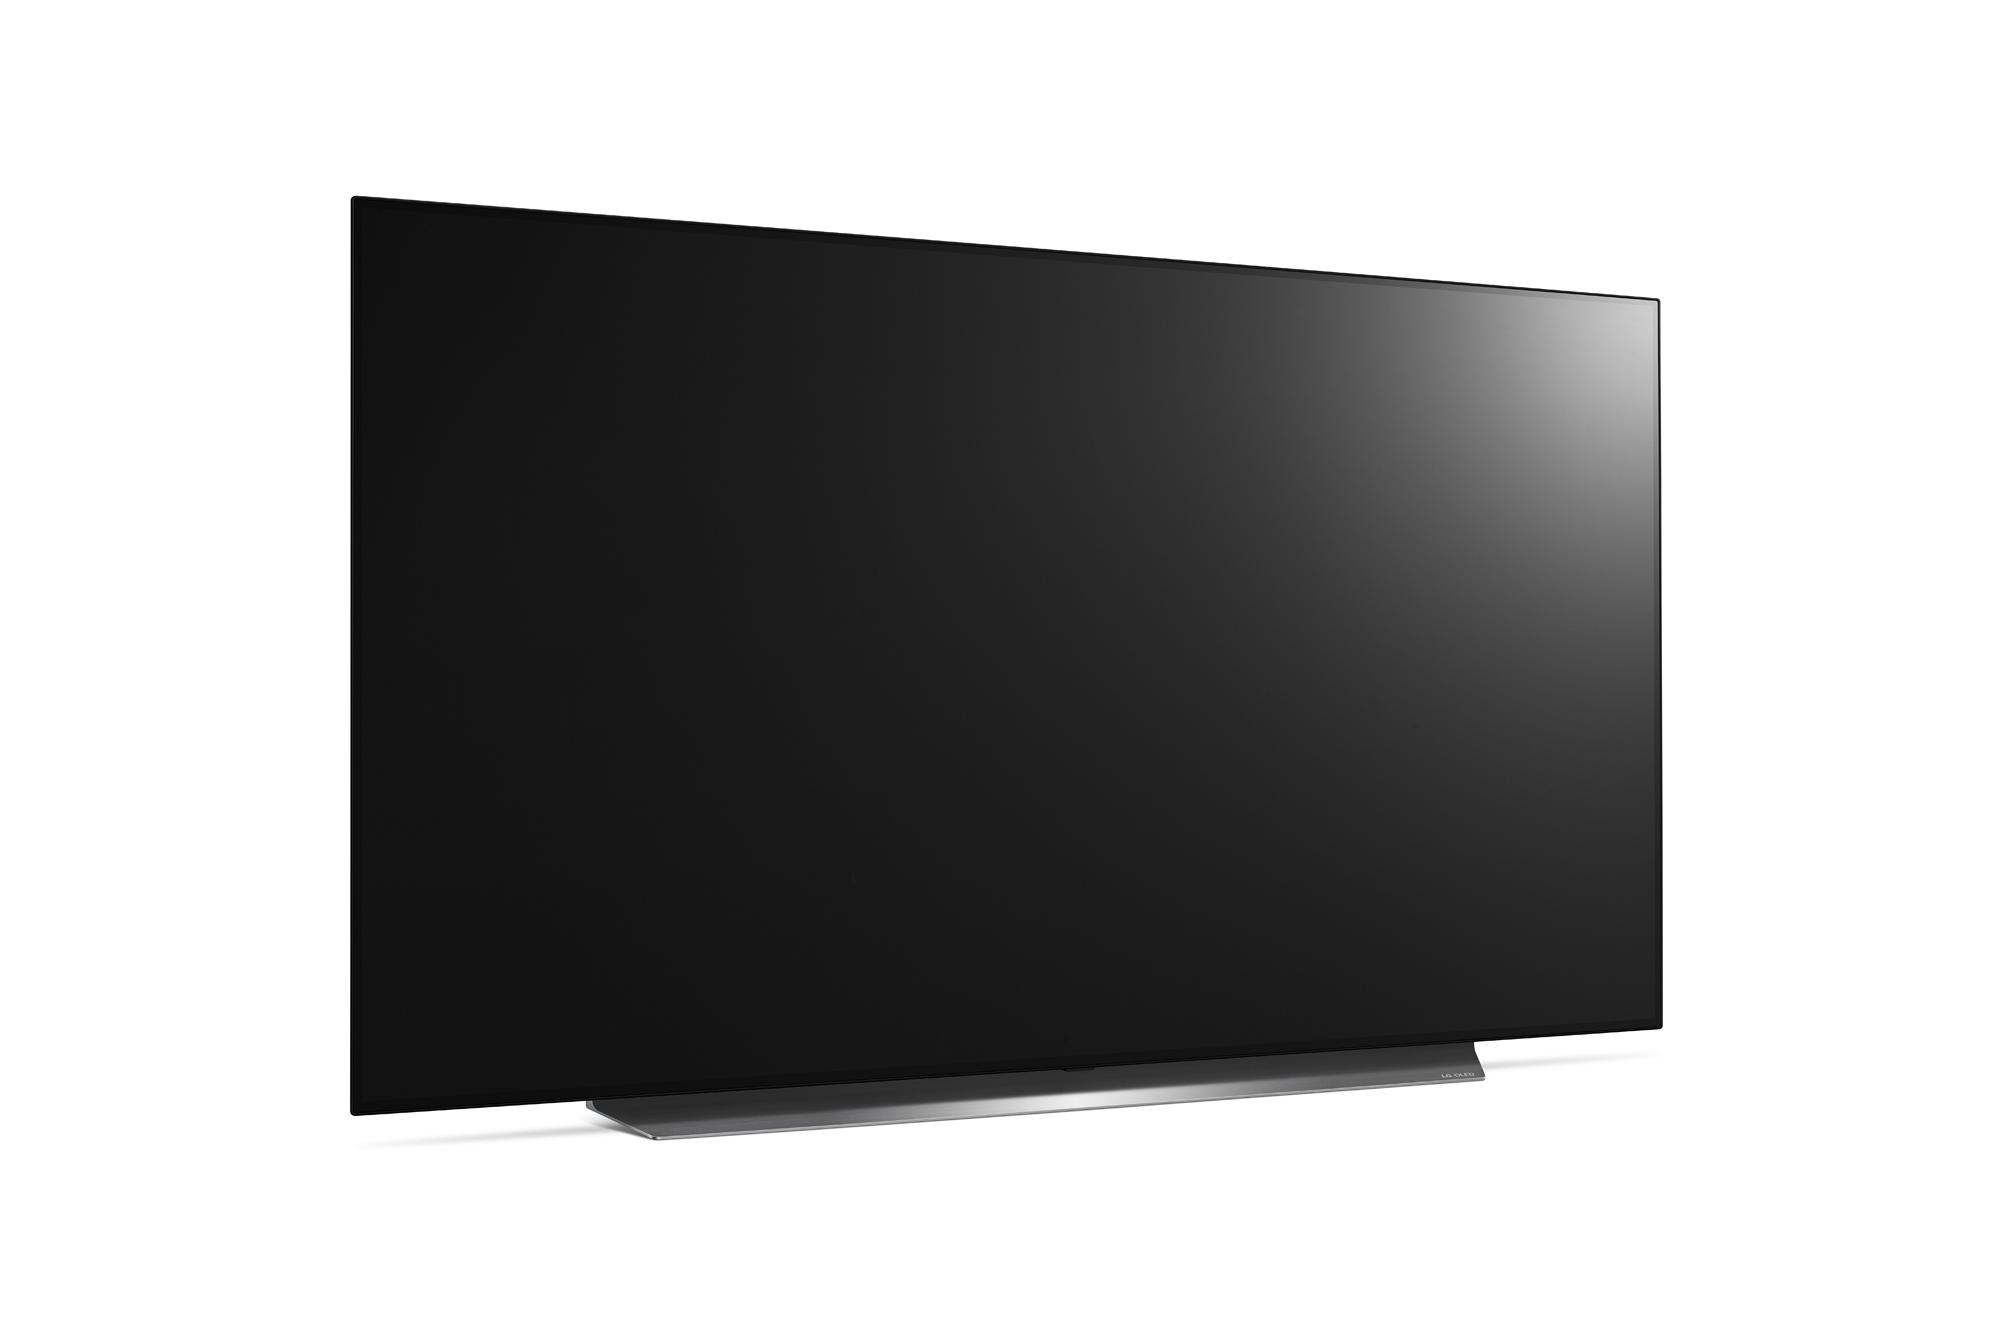 LG Pro:Centric SMART 65ET960H (NA) 7